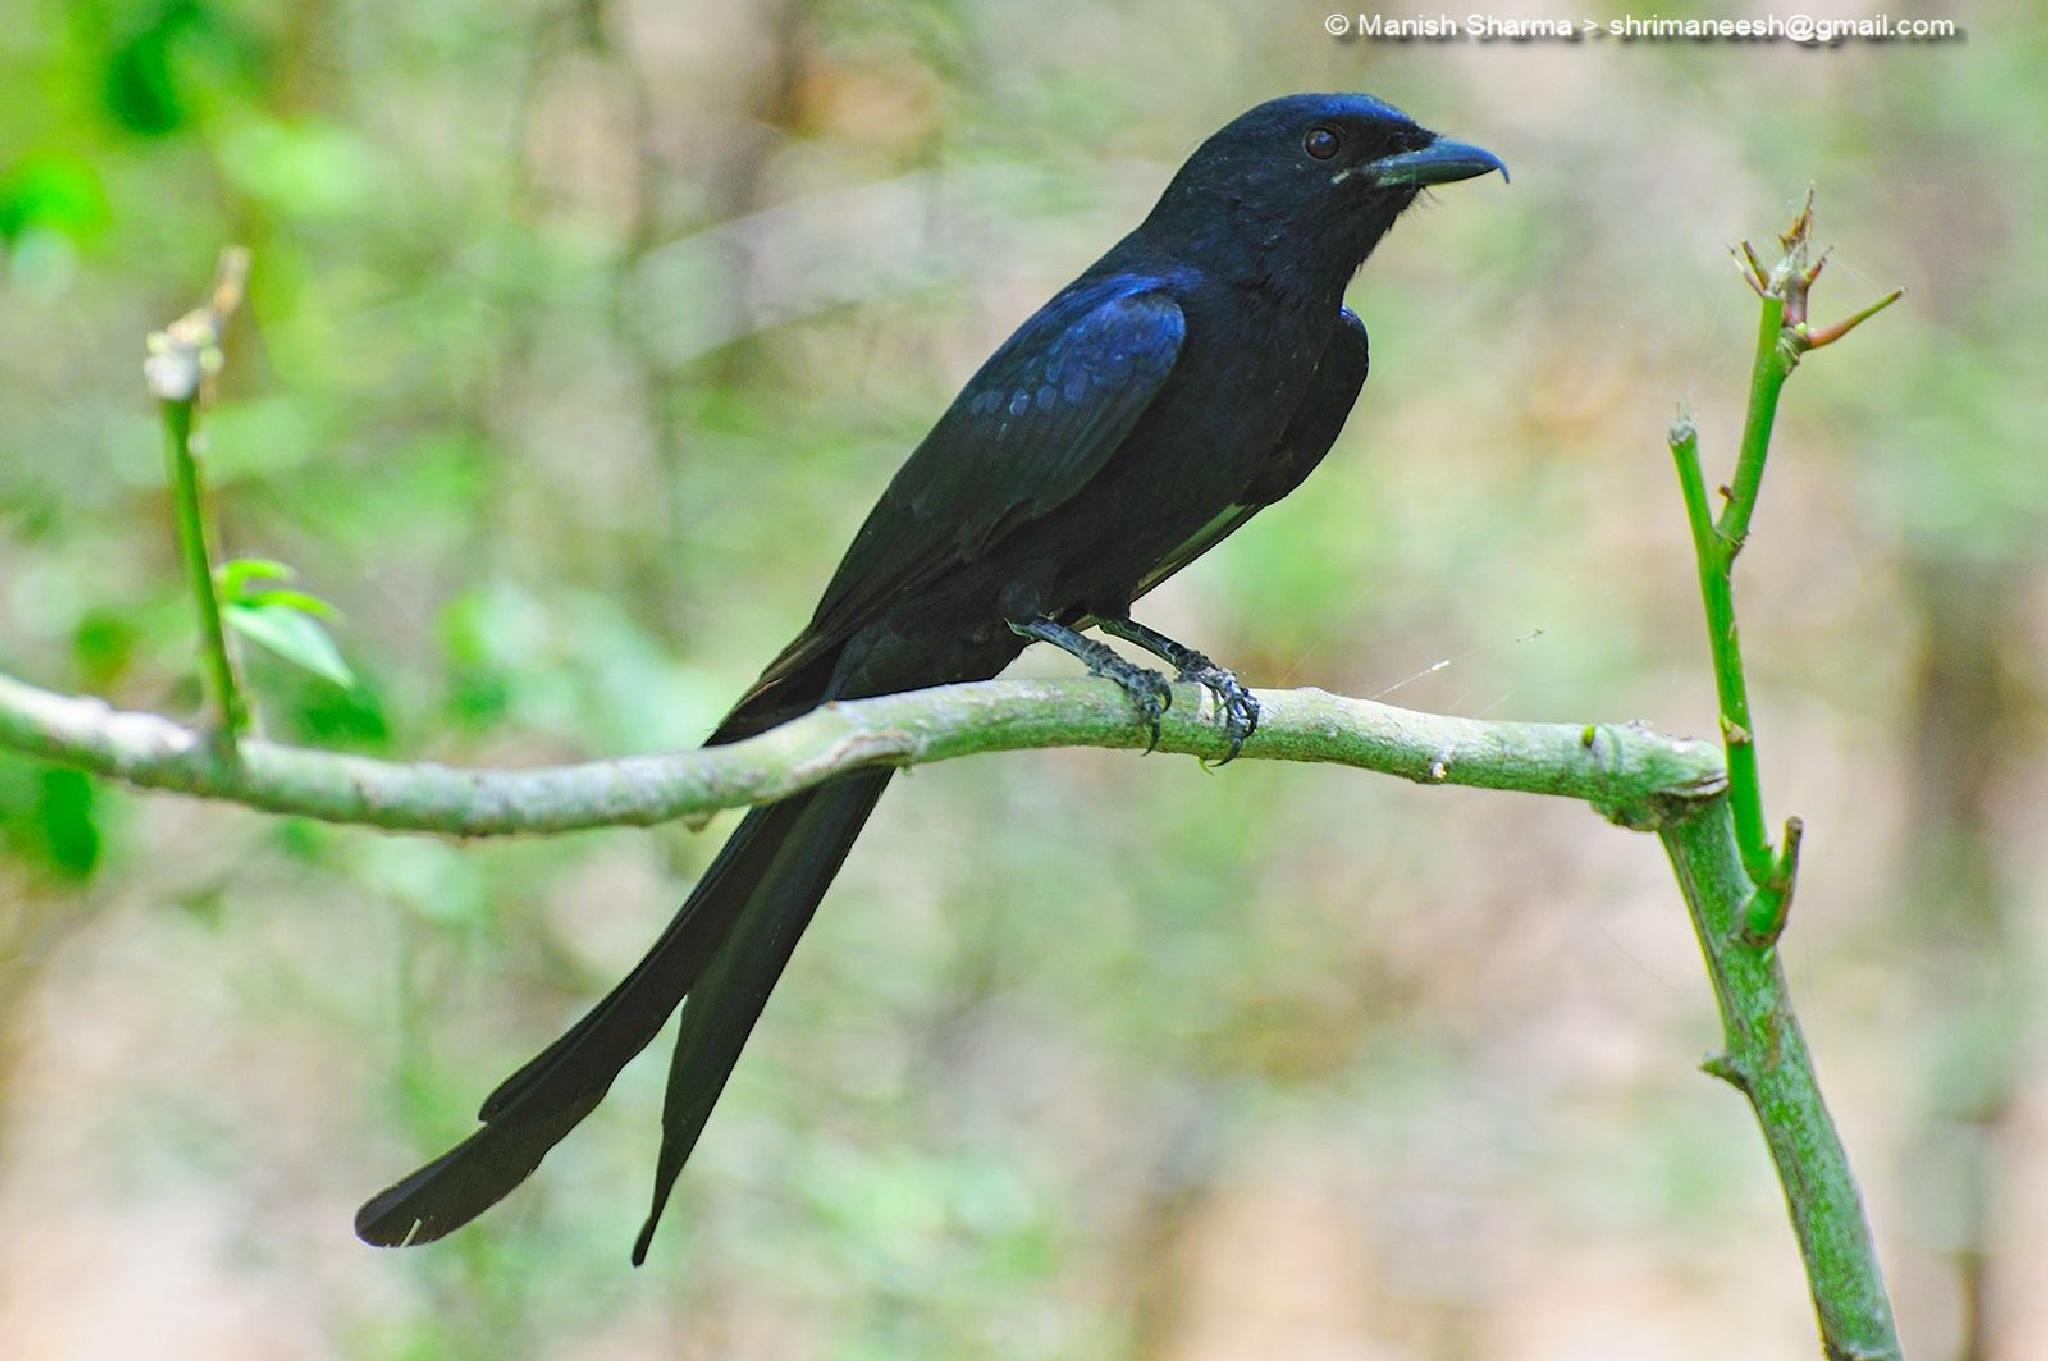 Black drongo....Scientific name: Dicrurus macrocercus by Maneesh Sharma